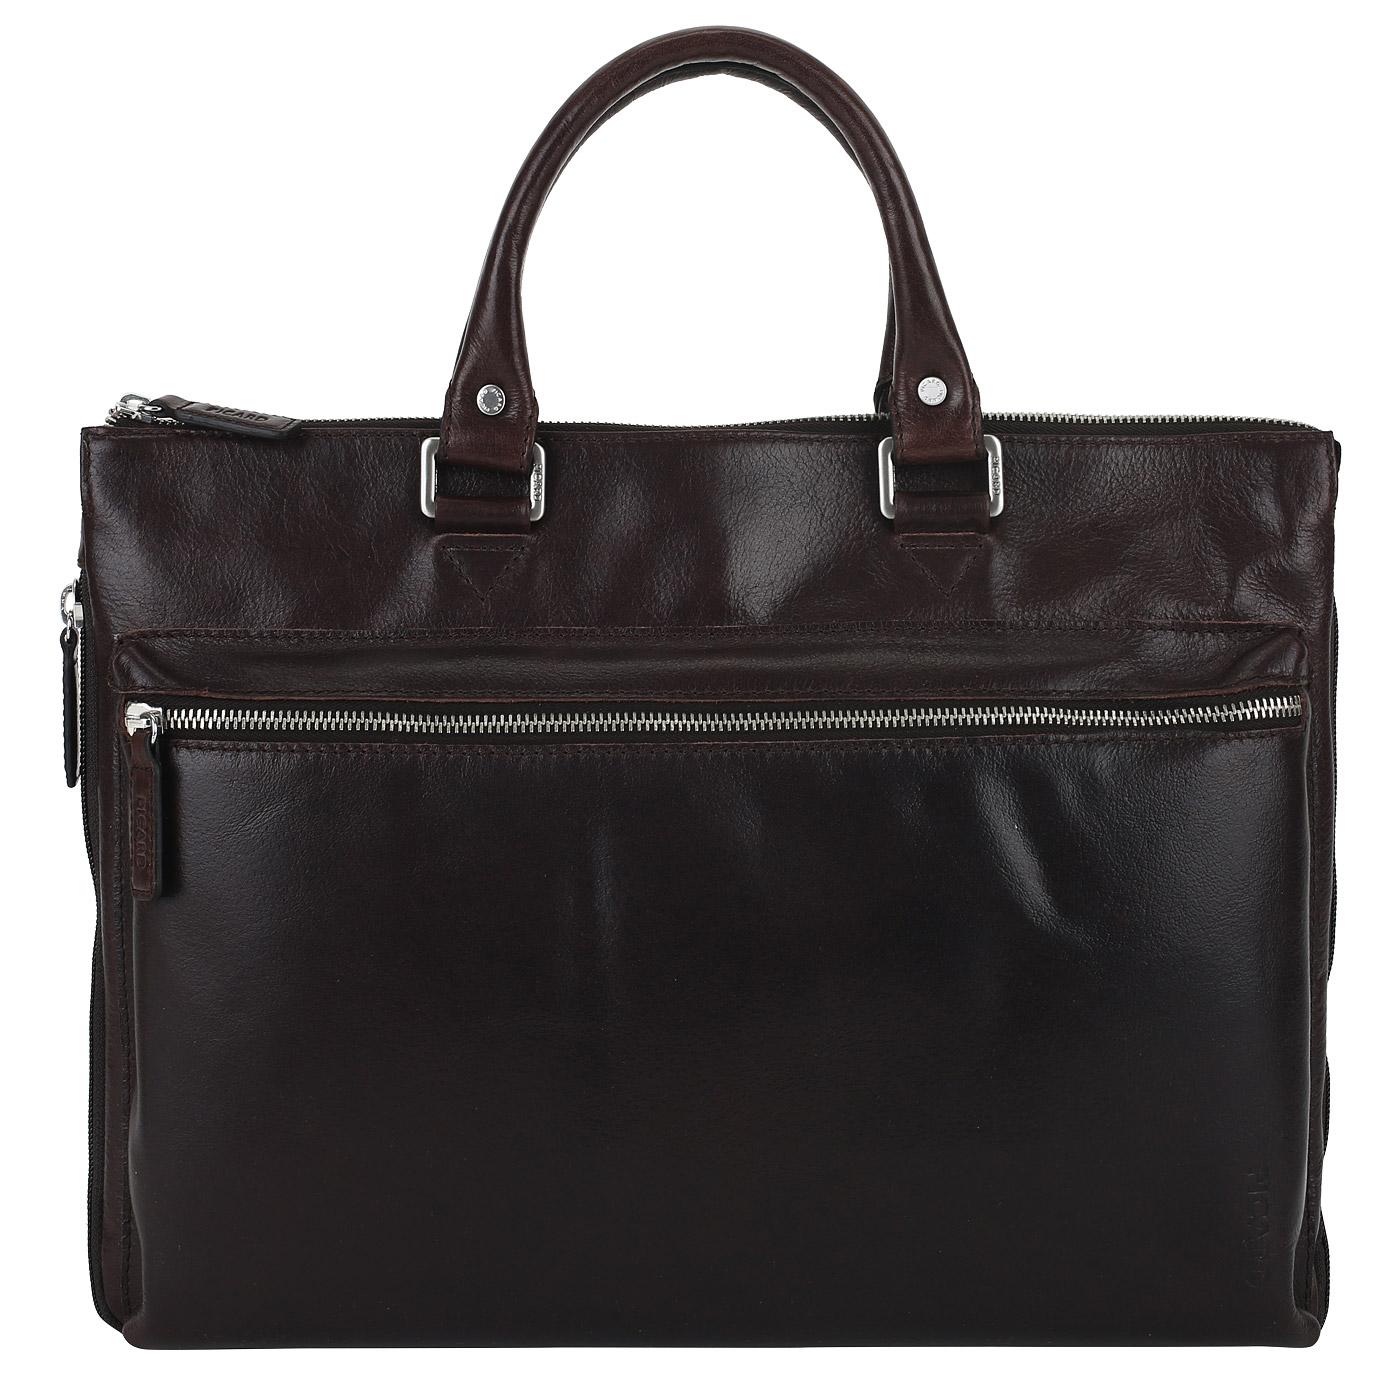 5a5699be4591 Мужская сумка мужская, глянец,, Сумки мужские Picard — интернет-магазин  Burguy.ru ...